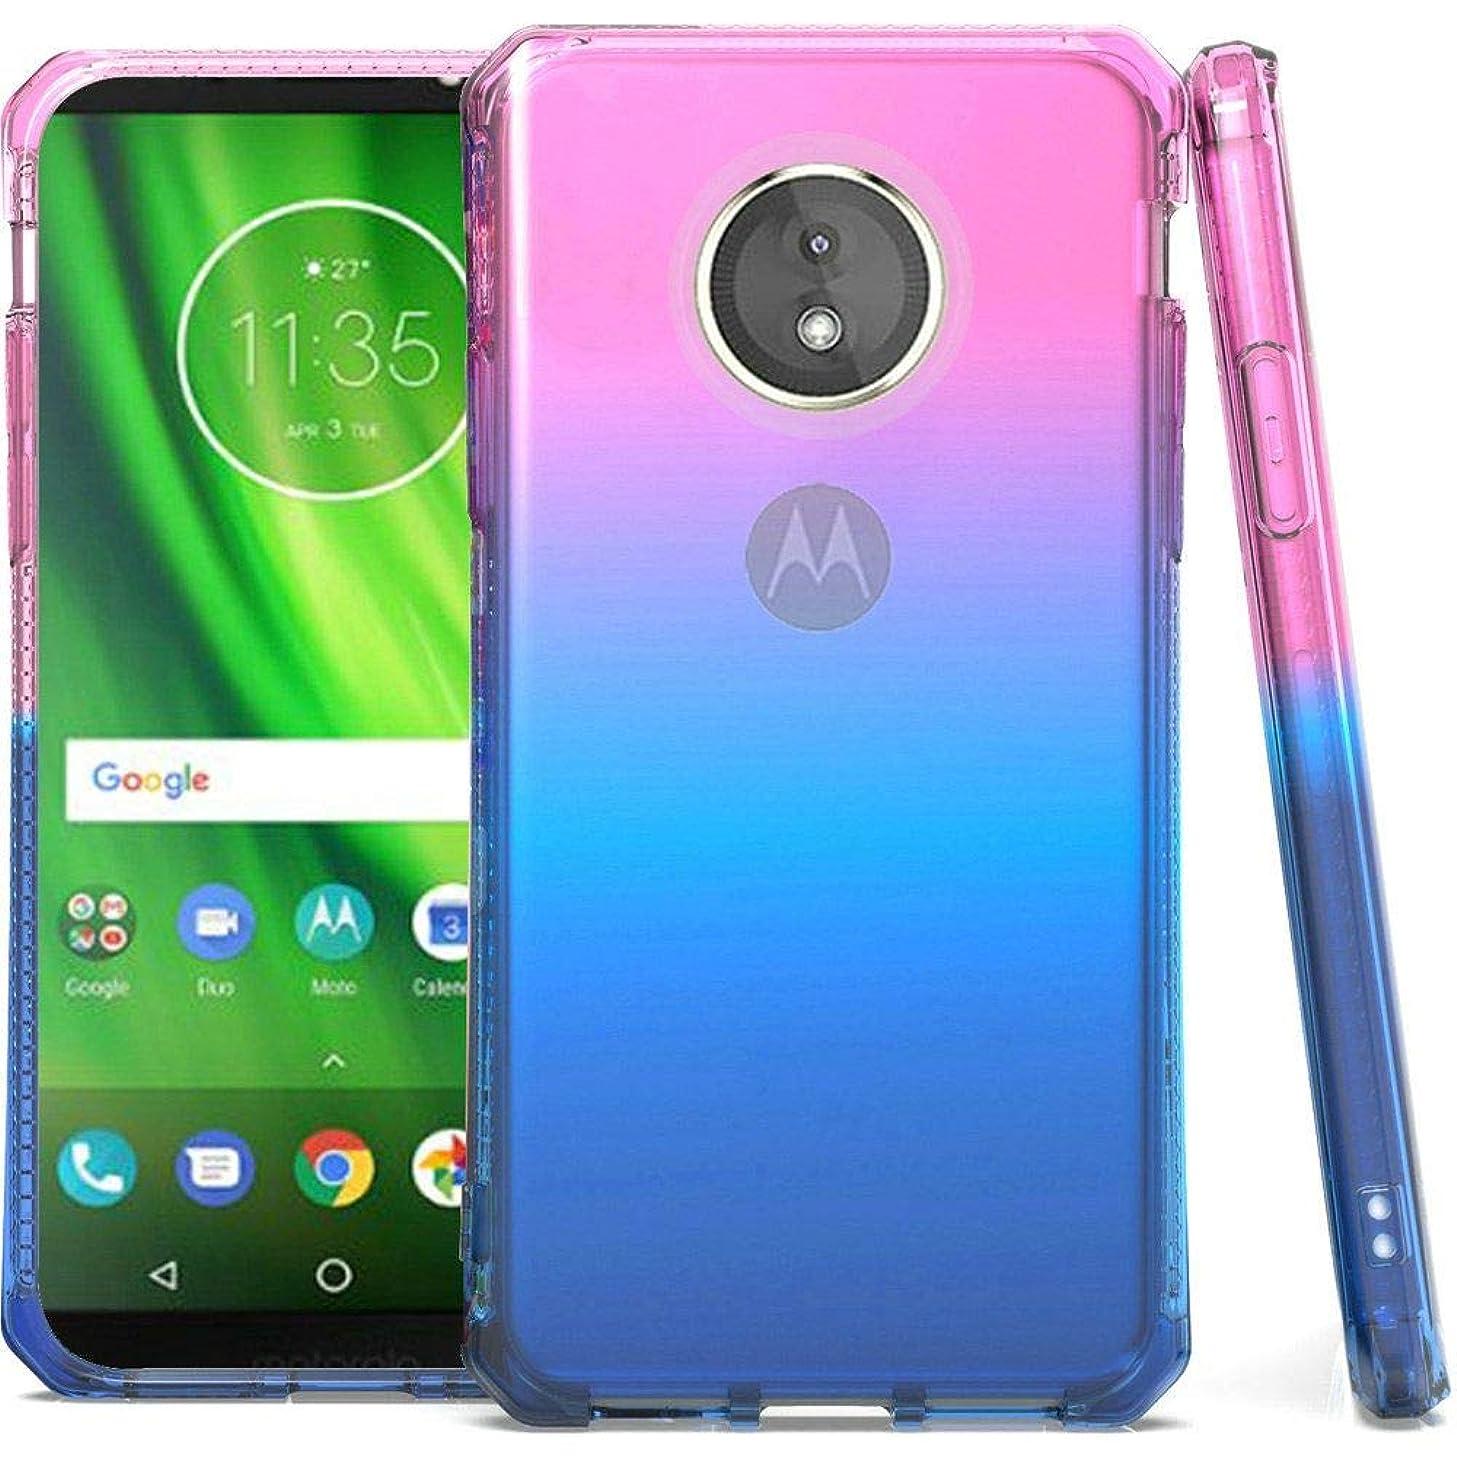 Bemz Shockproof TPU Slim Fit Protective Phone Cover Case and Atom Cloth for Motorola Moto E5 XT1920DL - Pink/Blue/Dark Blue